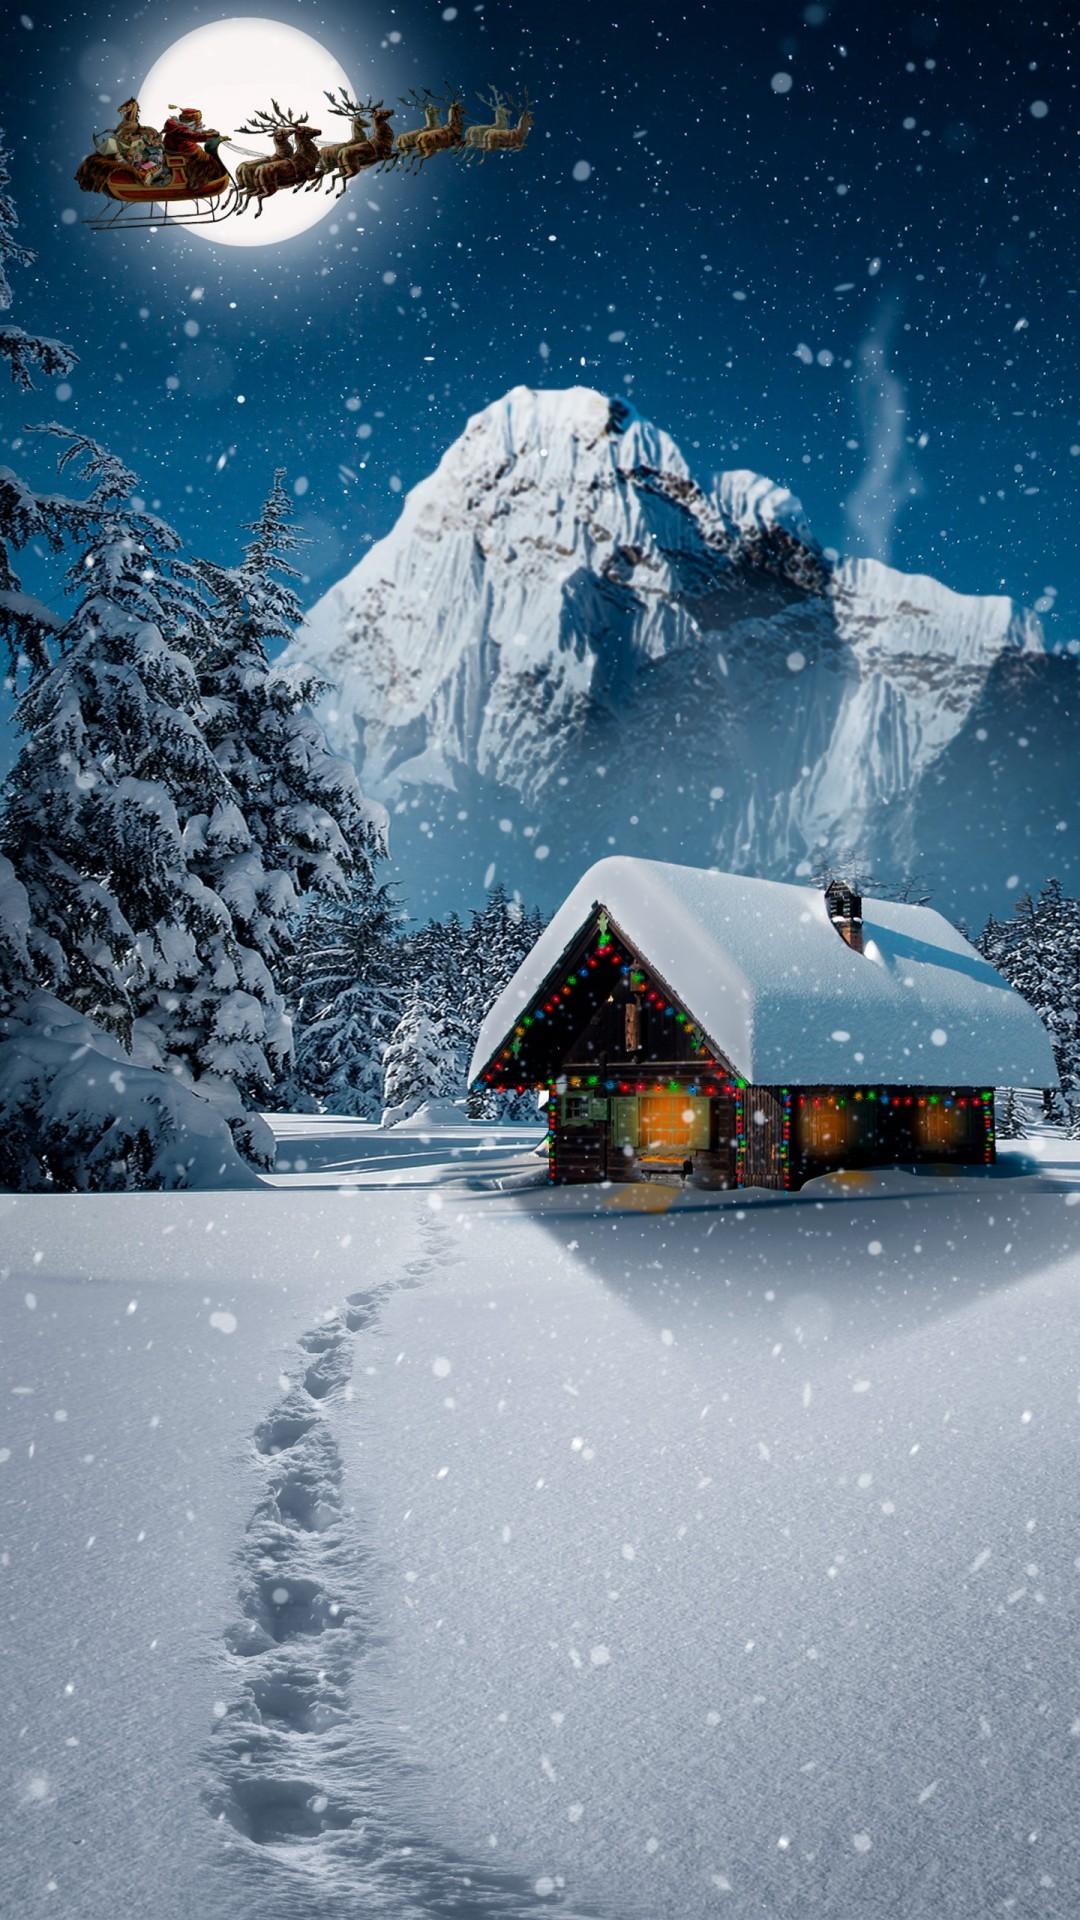 Free Christmas Winter phone wallpaper by liyah2